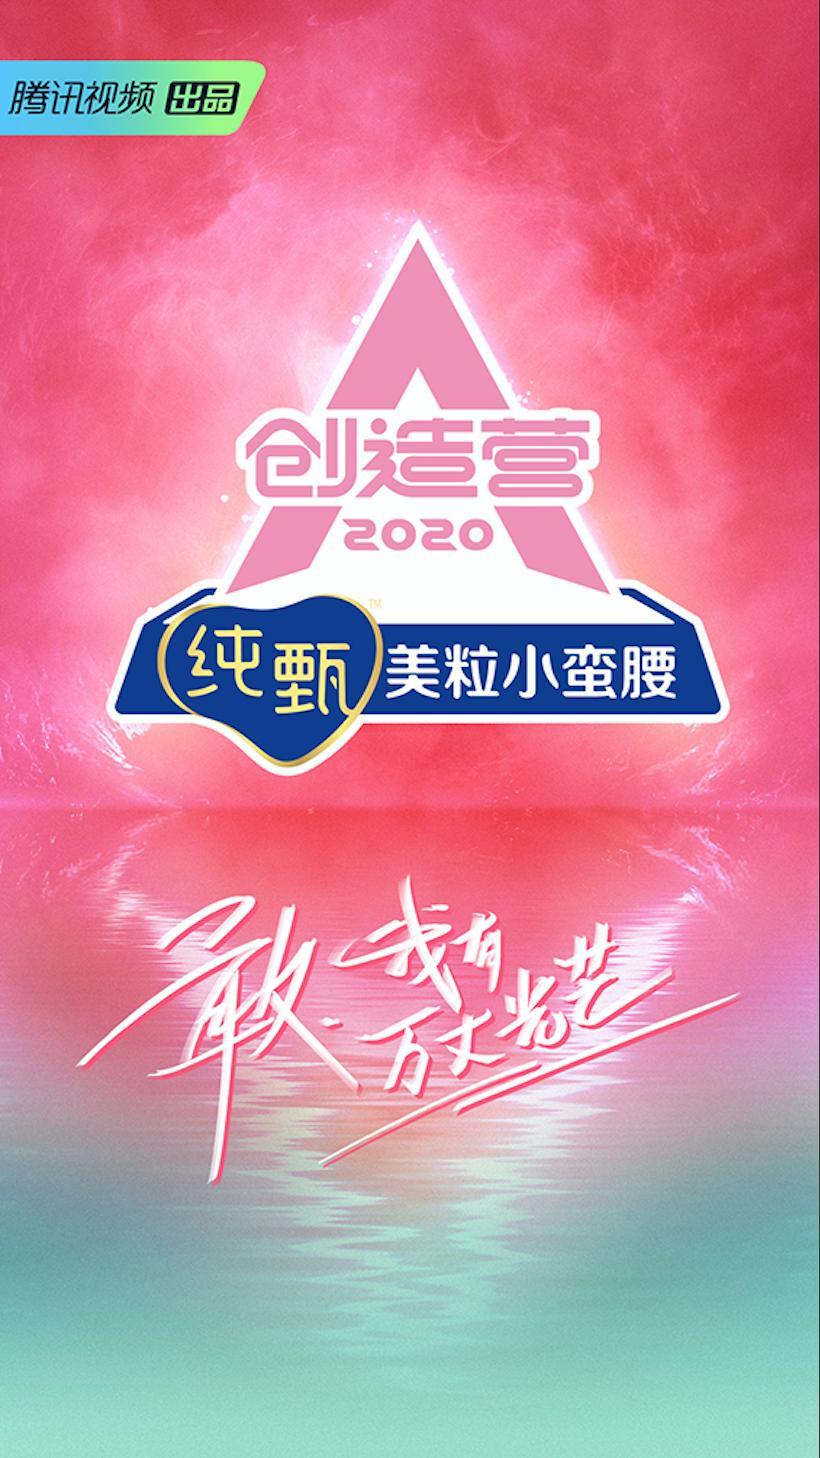 دانلود زیرنویس فارسی سریال Chuang 2020